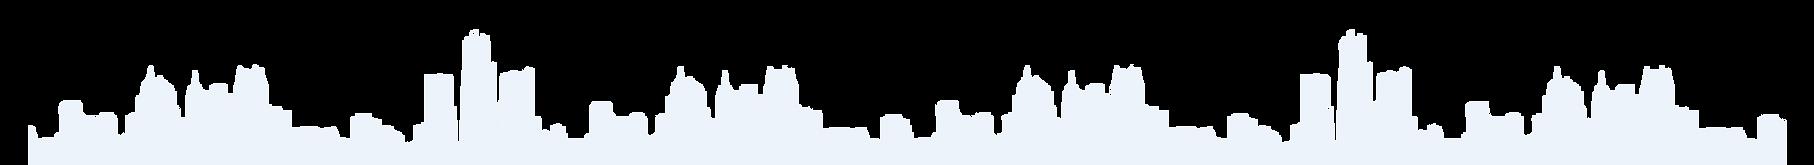 AcordPay   Website - Home_Banner 01 City